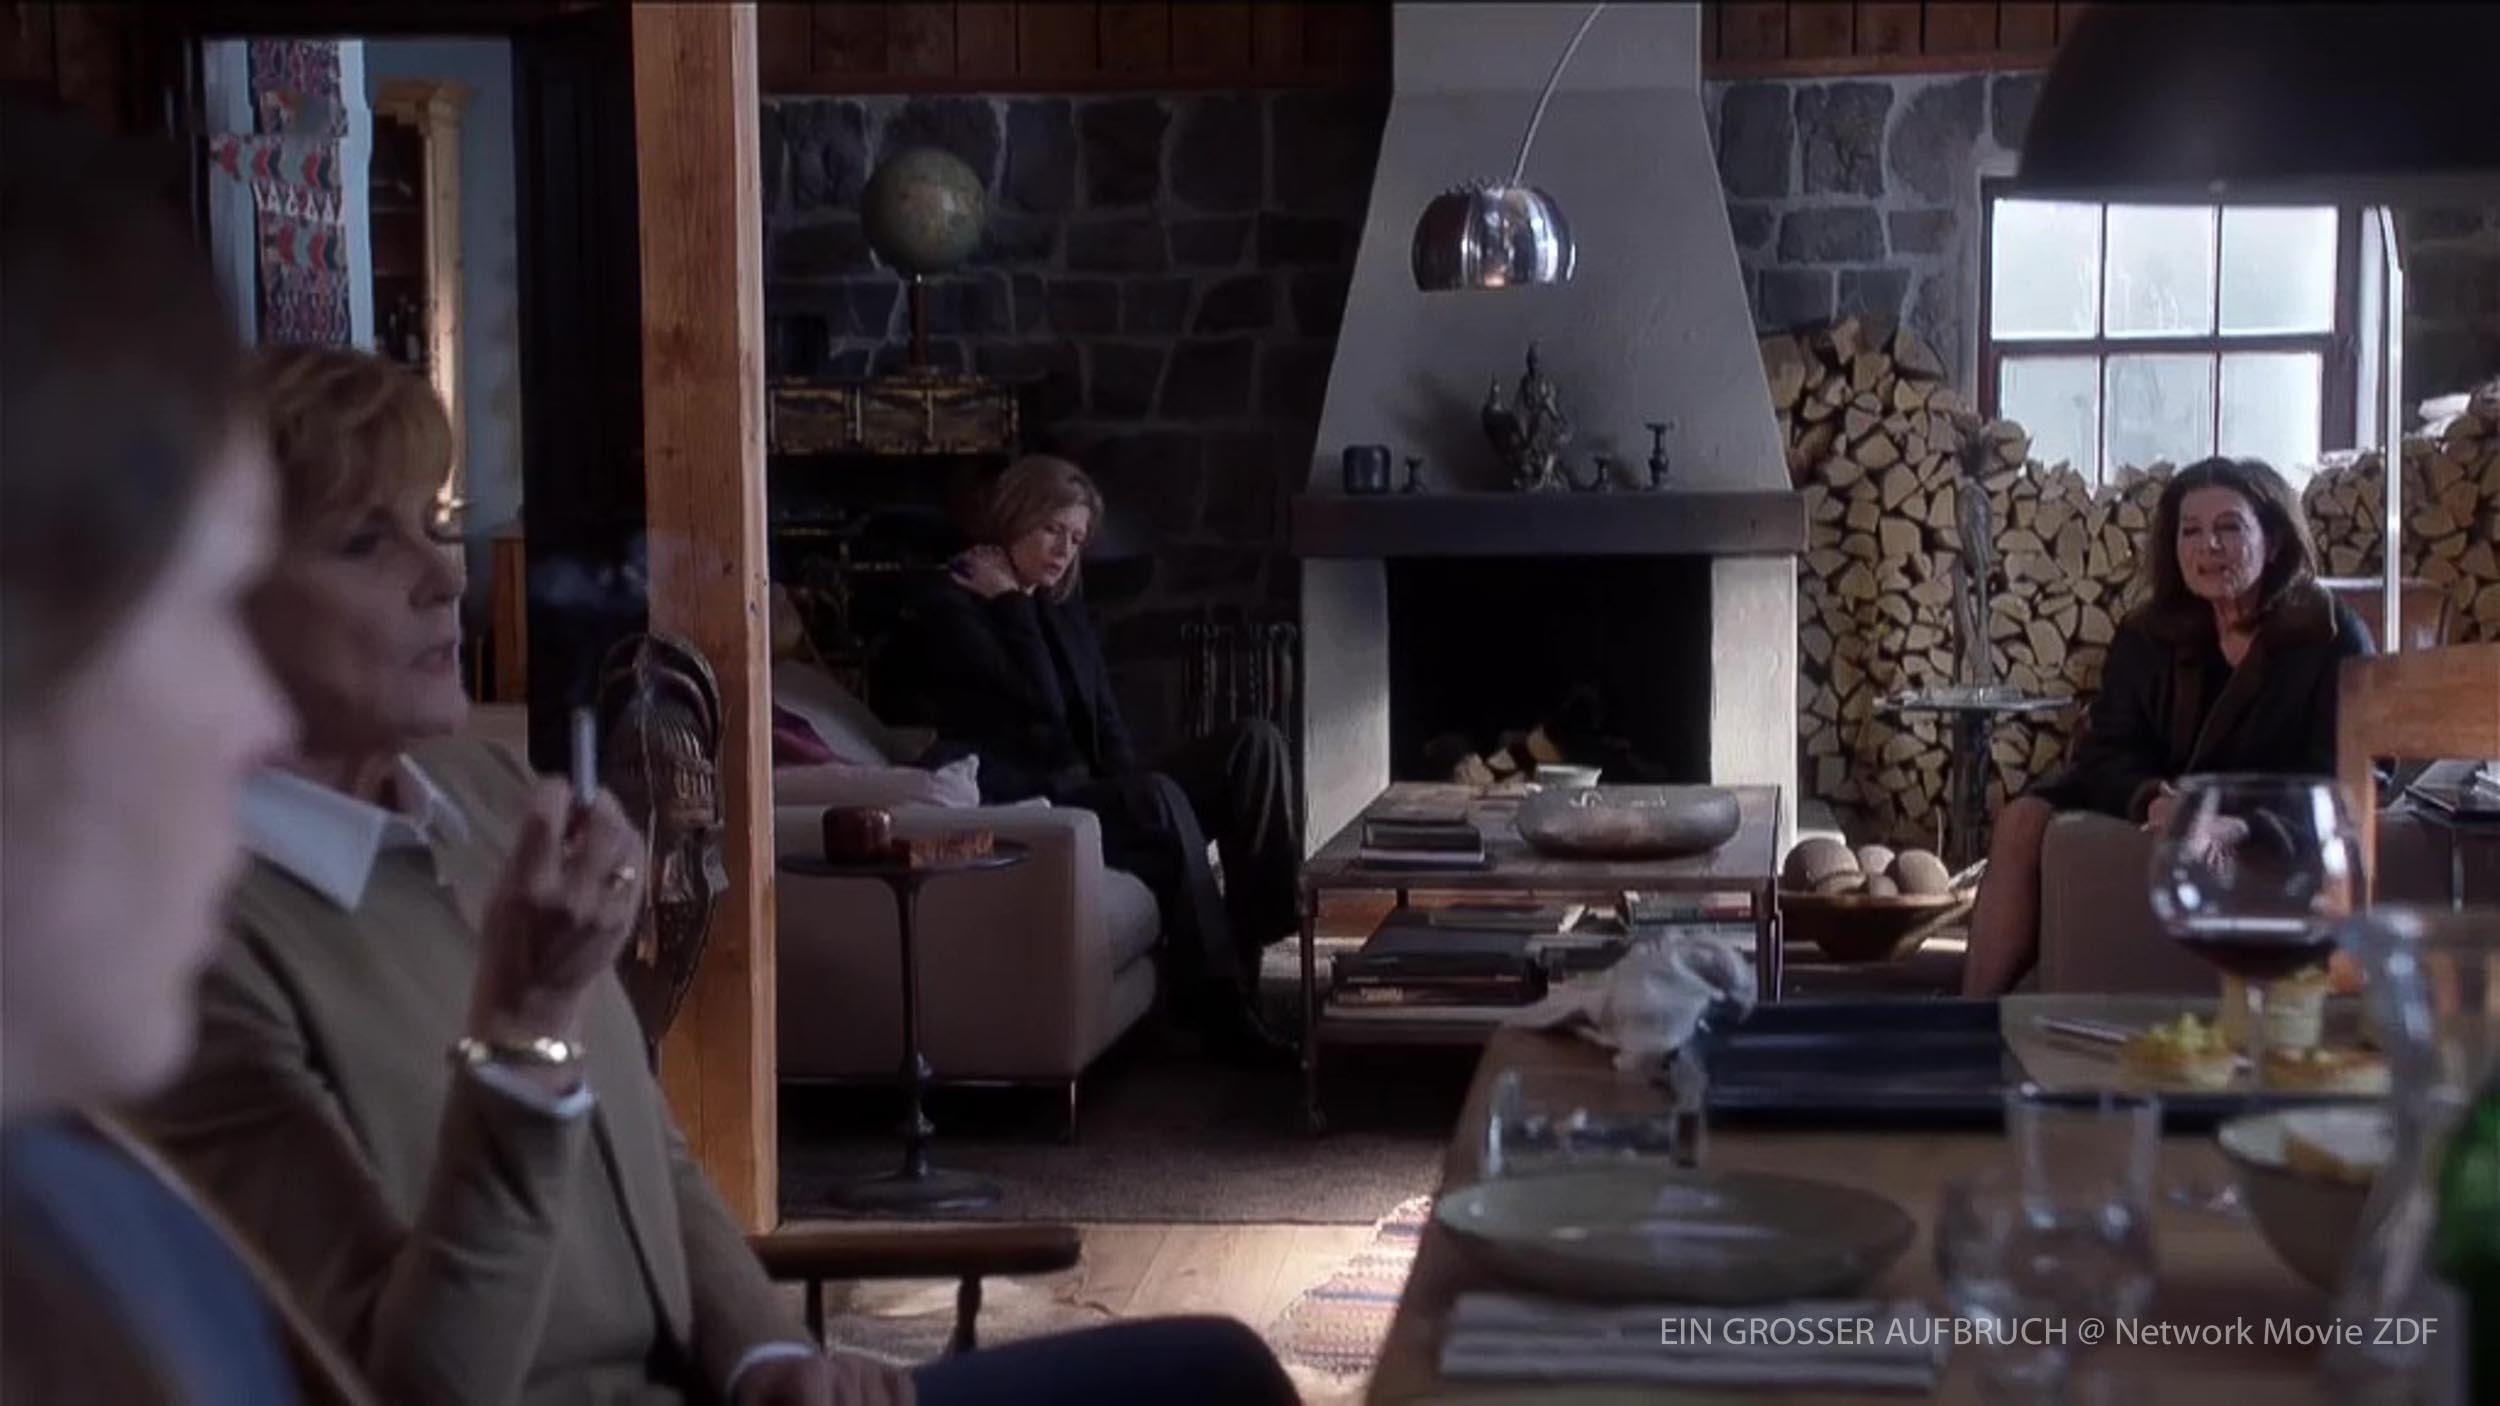 EIN GROSSER AUFBRUCH Regie Matti Geschonneck Szenenbild Thomas Freudenthal-11.jpg